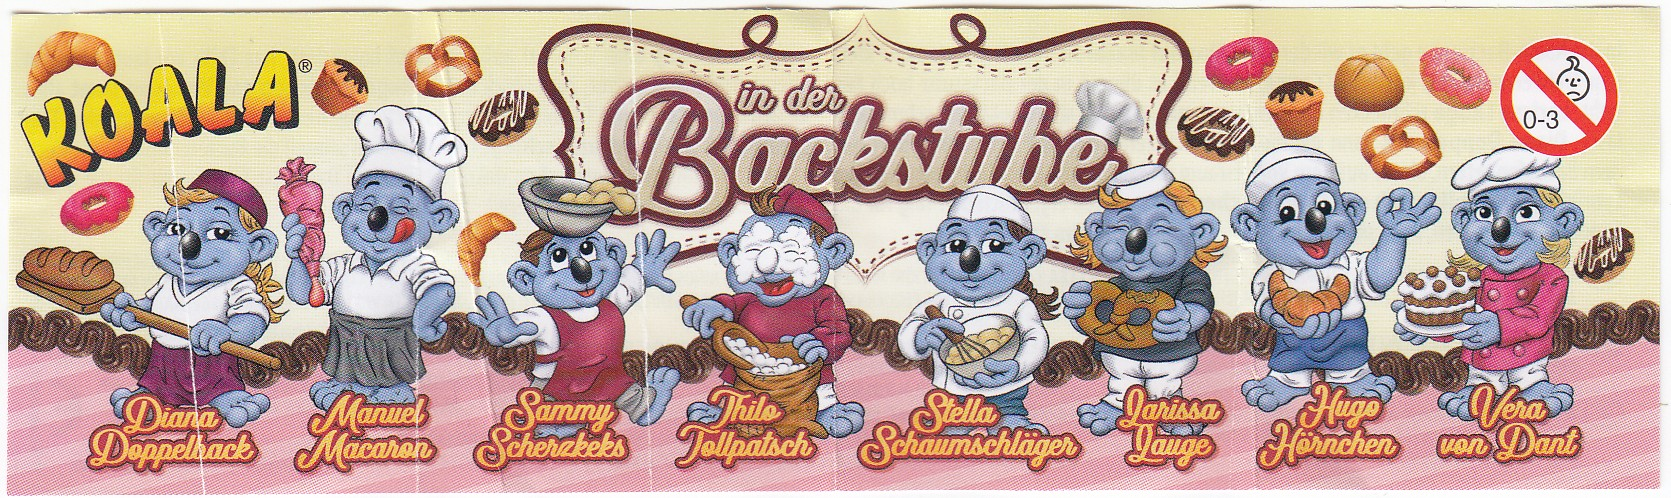 Kuchenmeister/Schöller (Koala) Bpz-koala